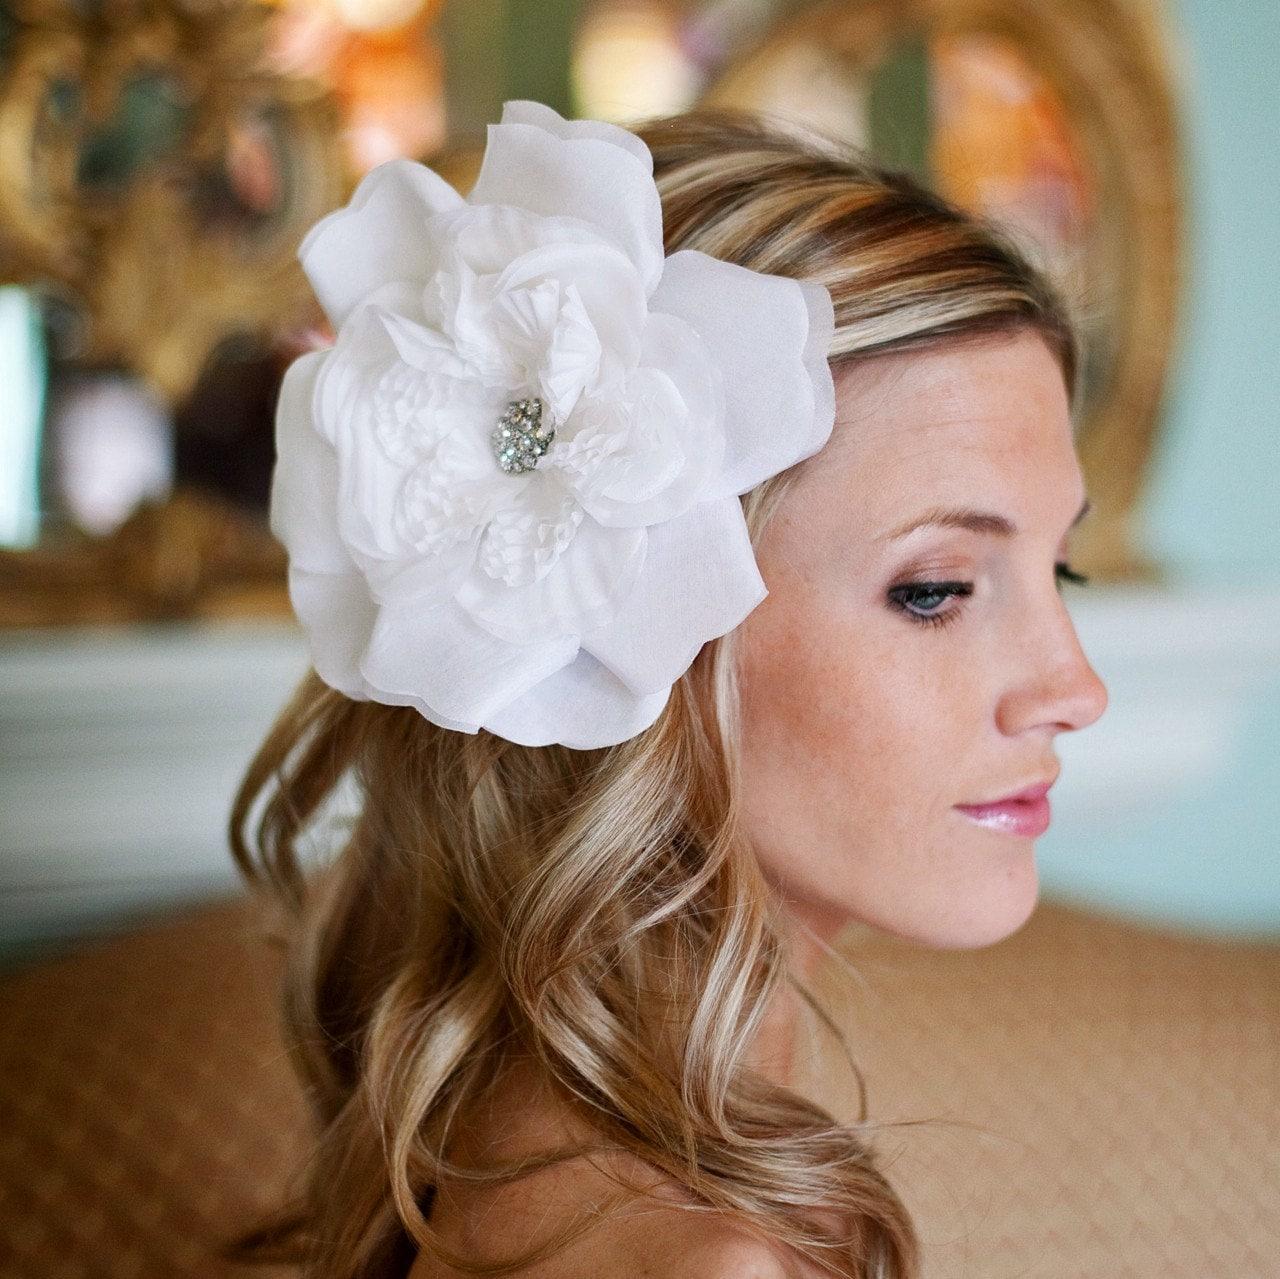 Flower Headband Tutorial: Estylo Jewelry: Flower Headband Or Clip DIY Tutorial